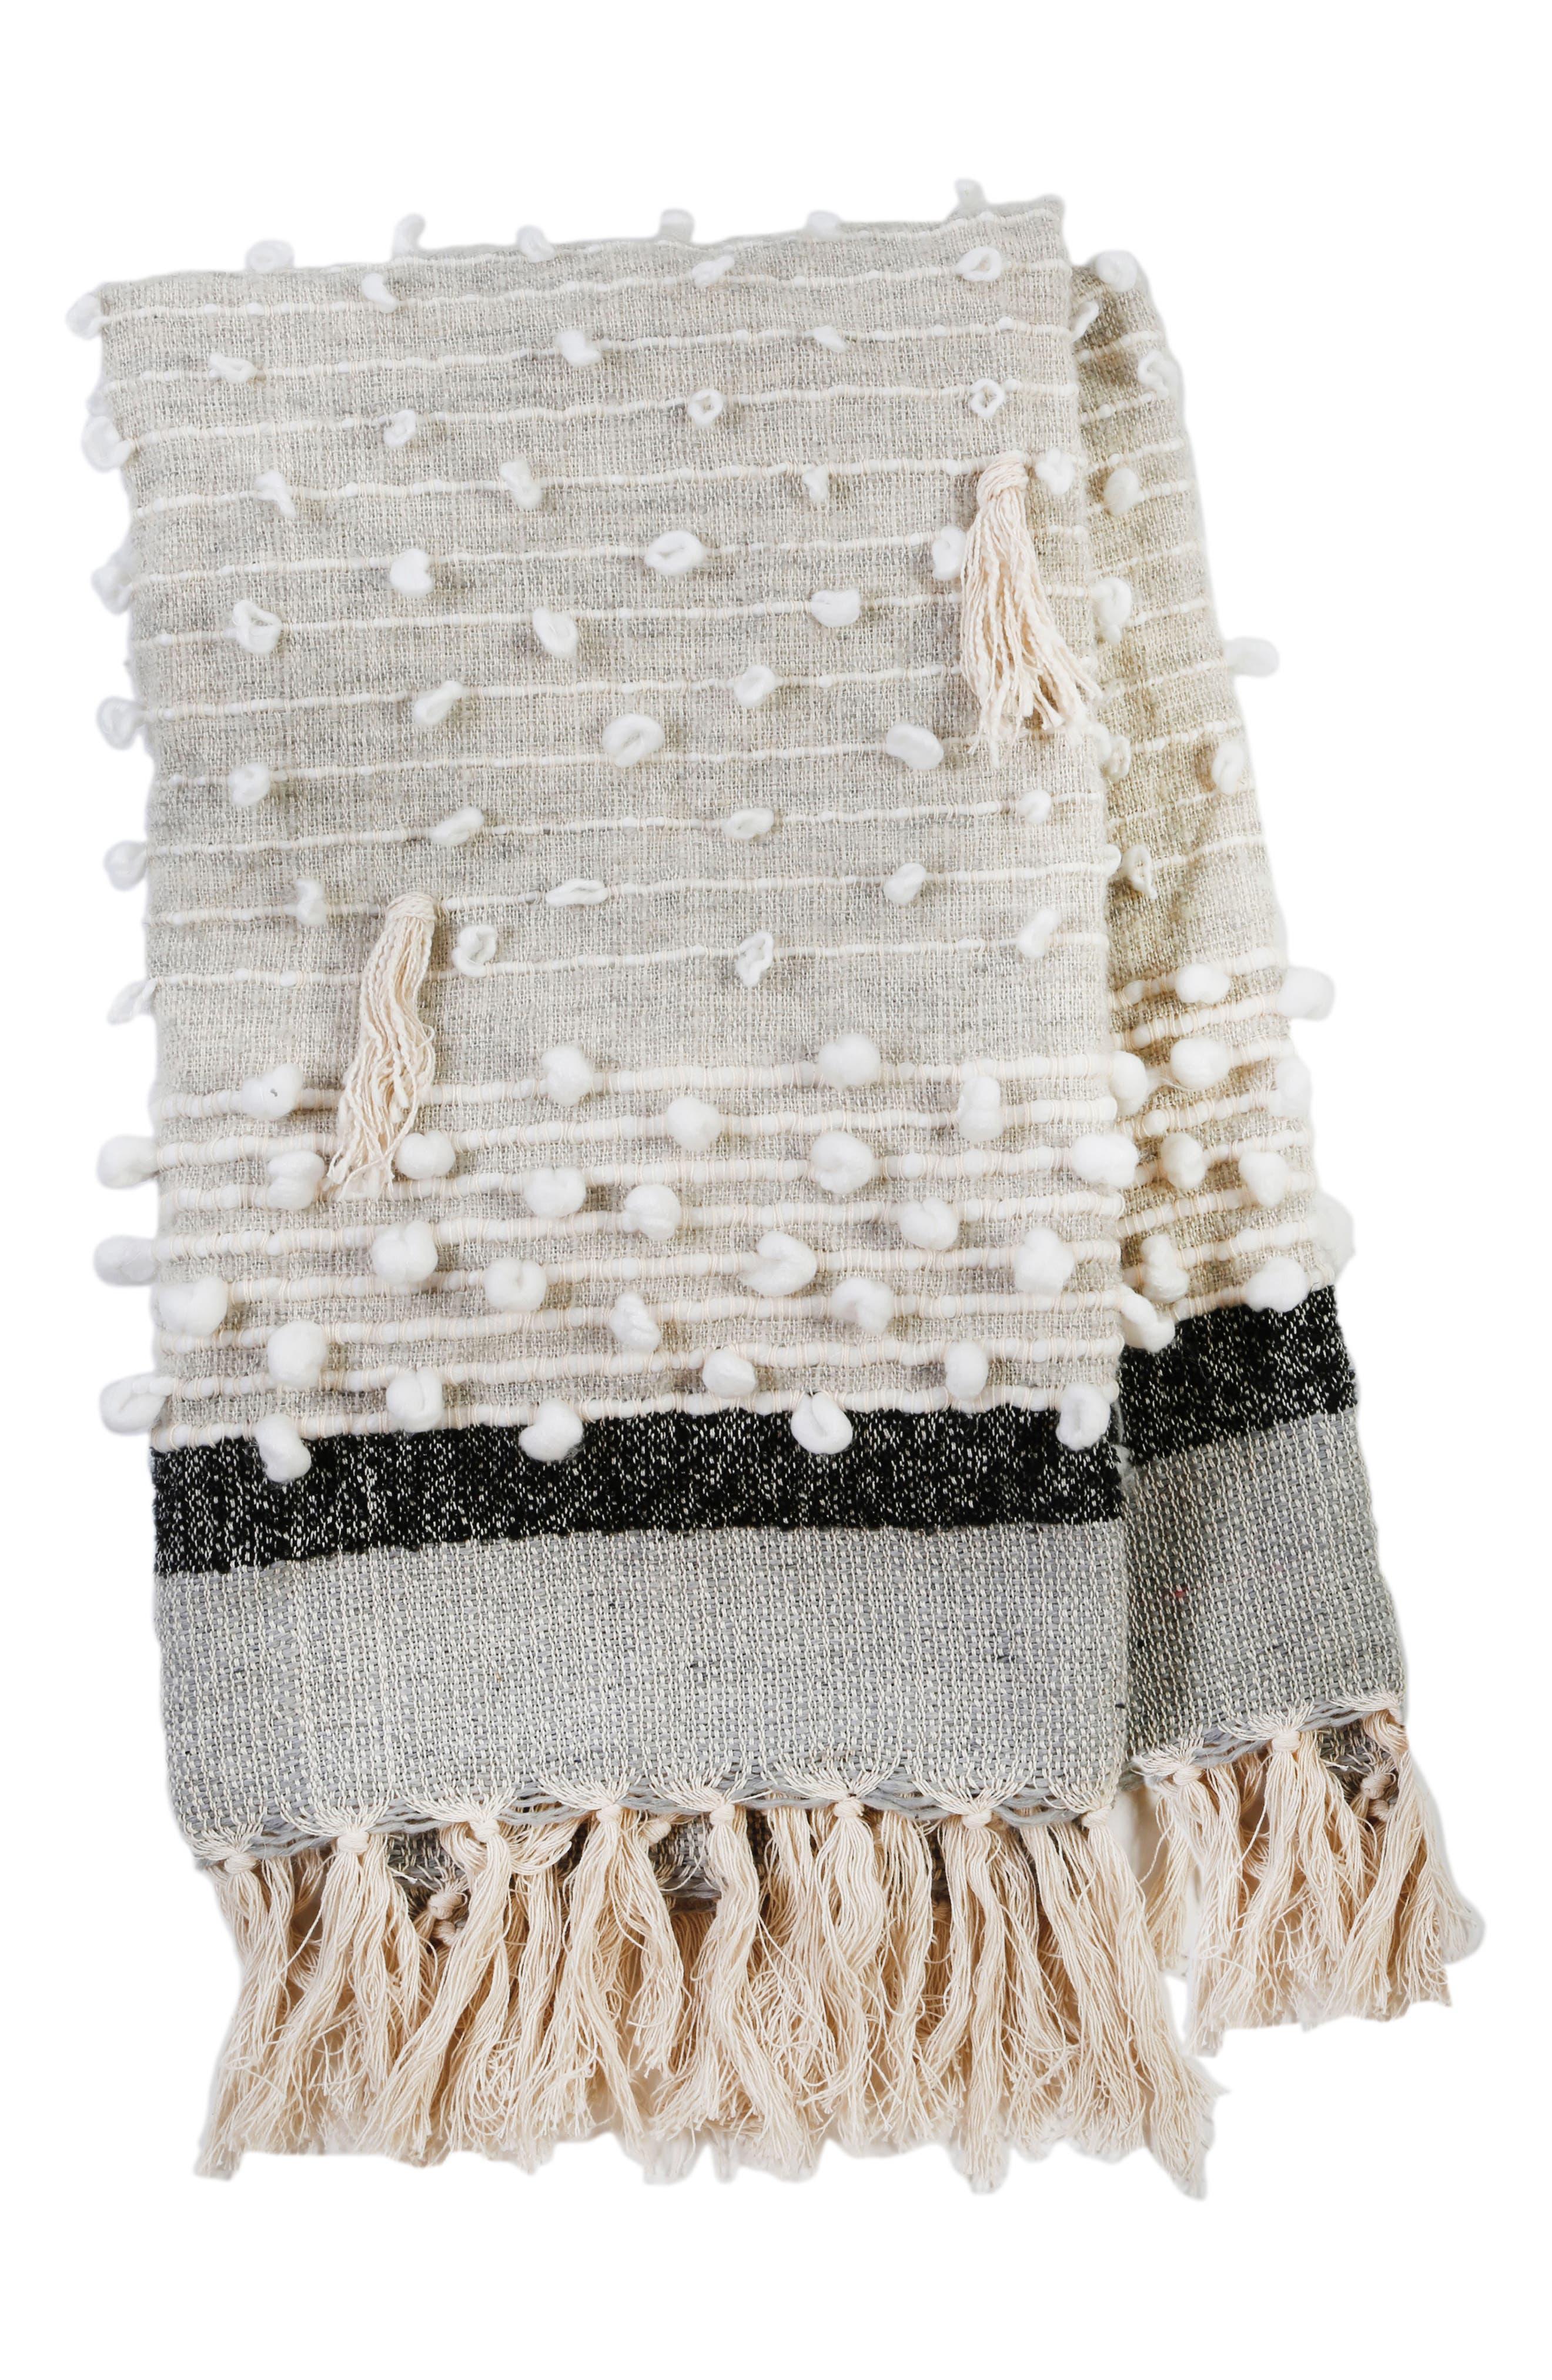 Ziggy Woven Throw Blanket,                             Main thumbnail 1, color,                             GREY/ CHARCOAL